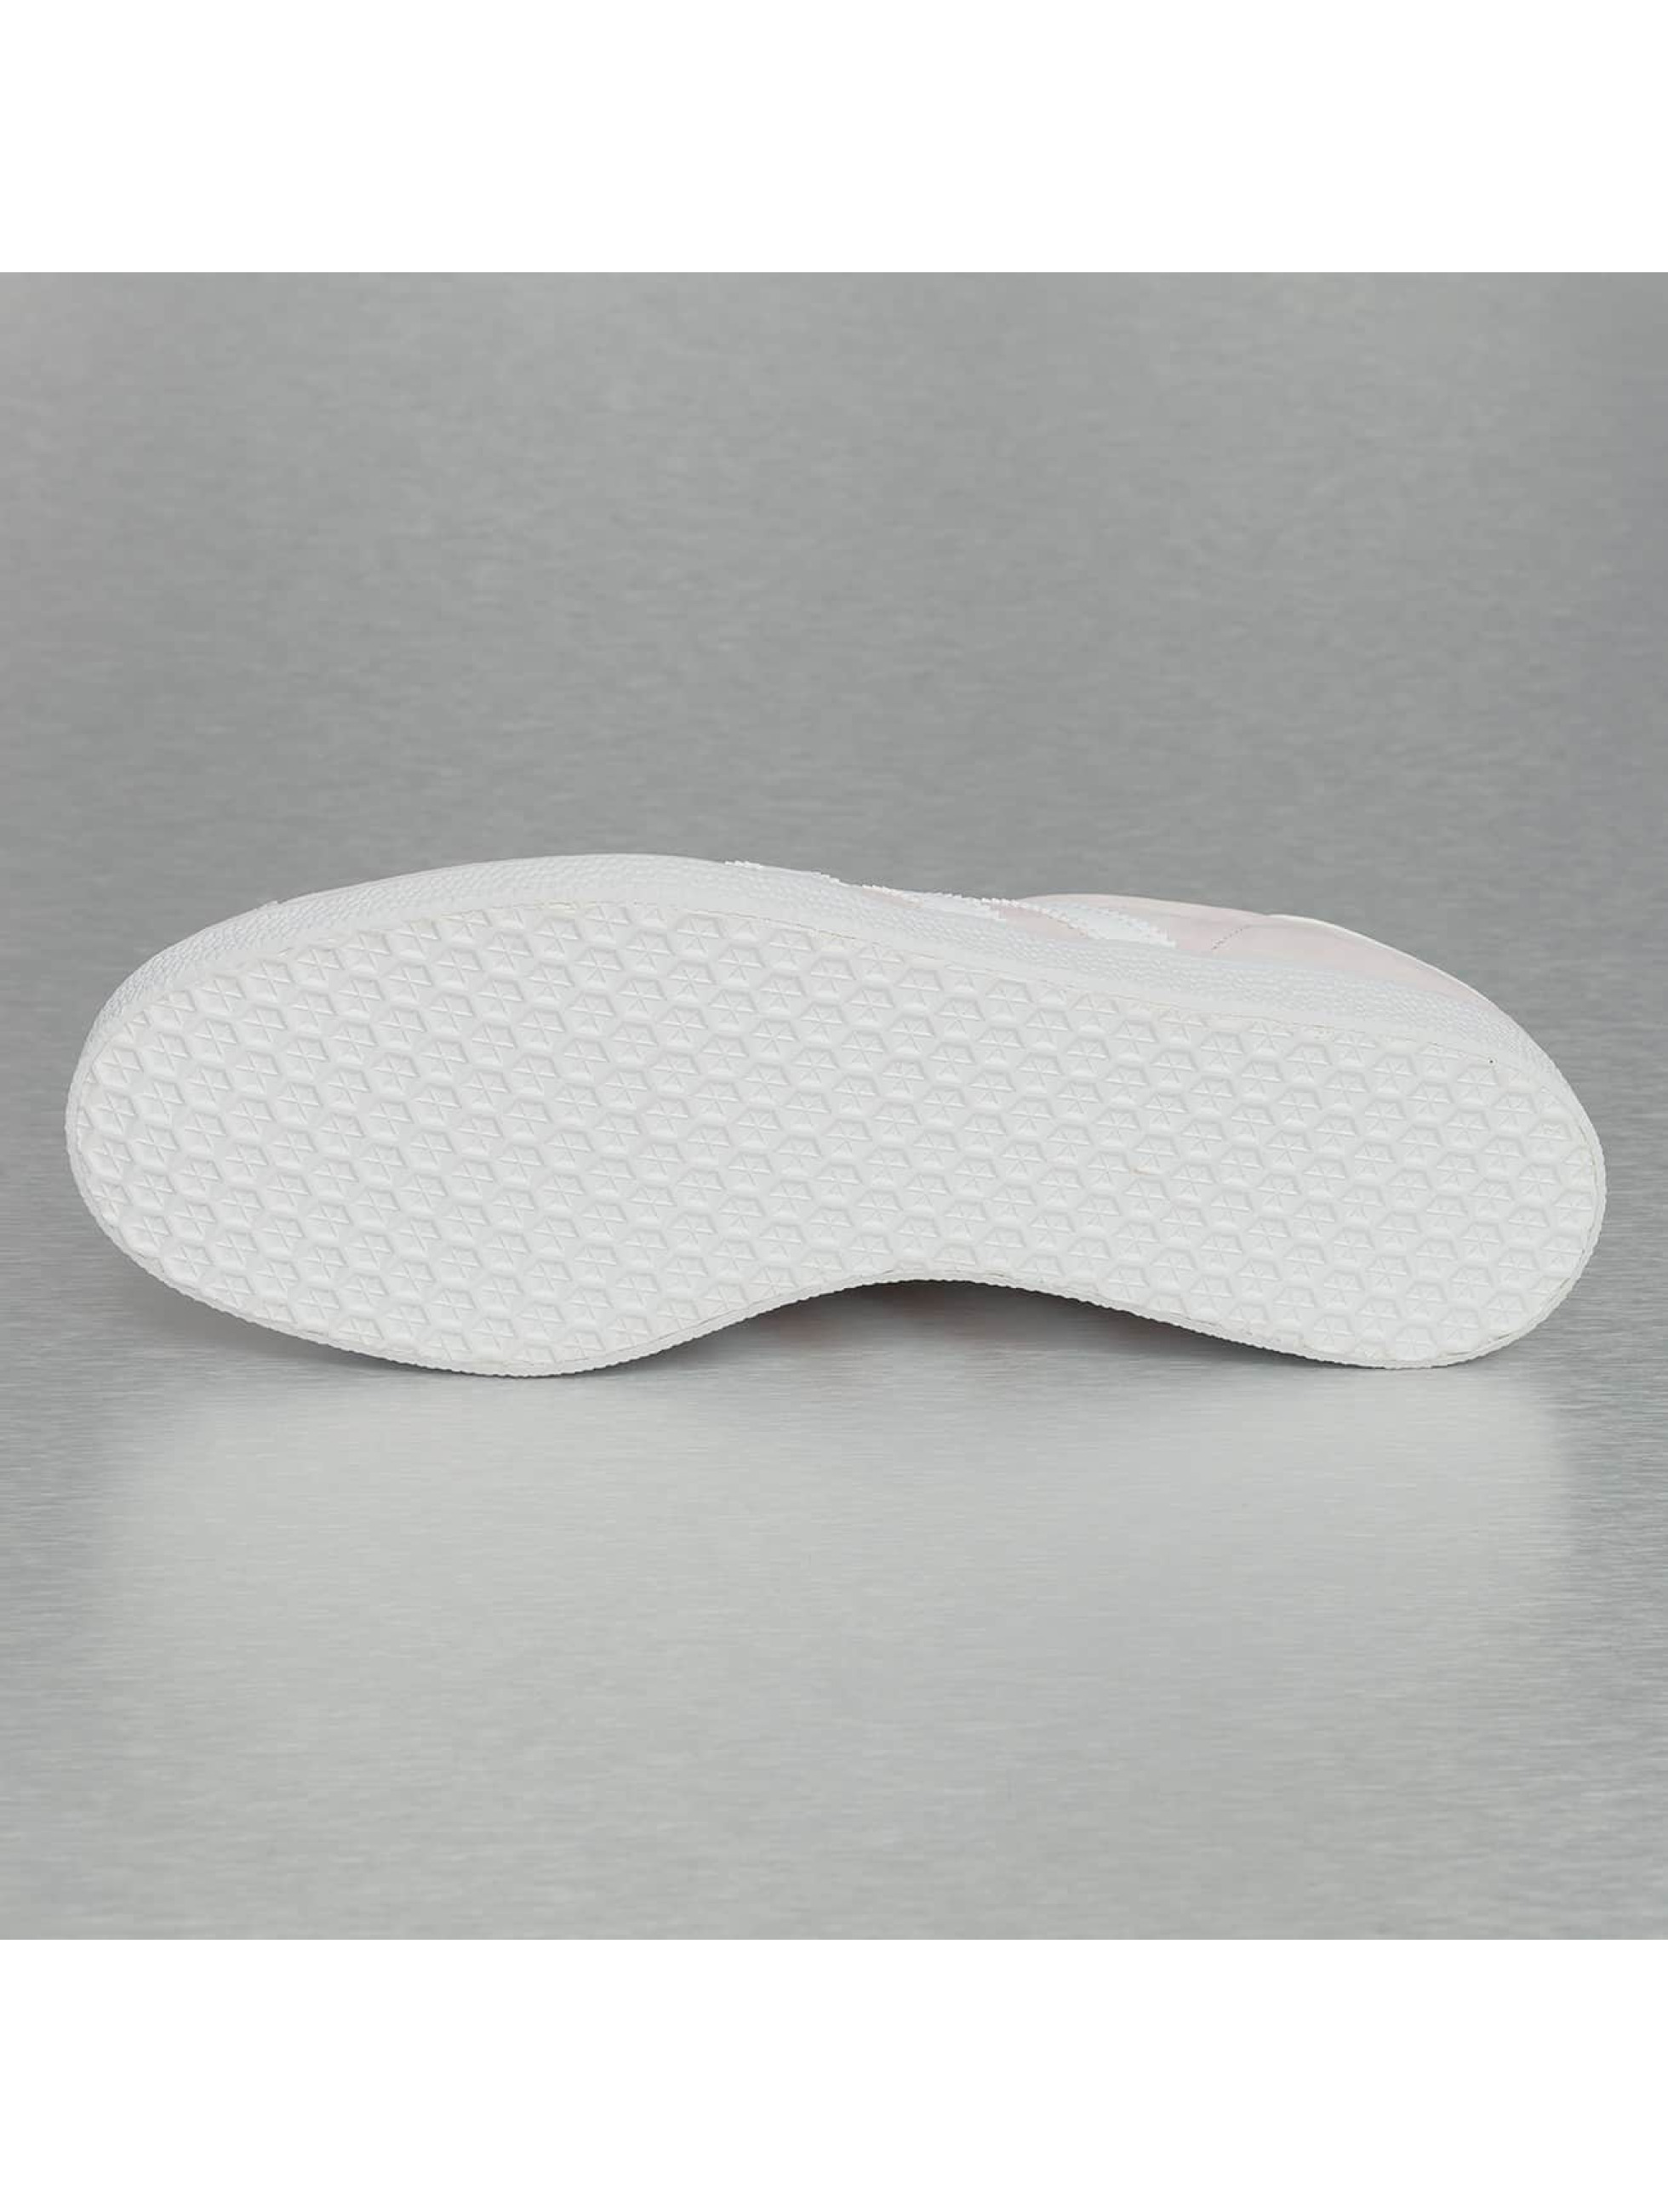 adidas originals Sneakers Gazelle fioletowy